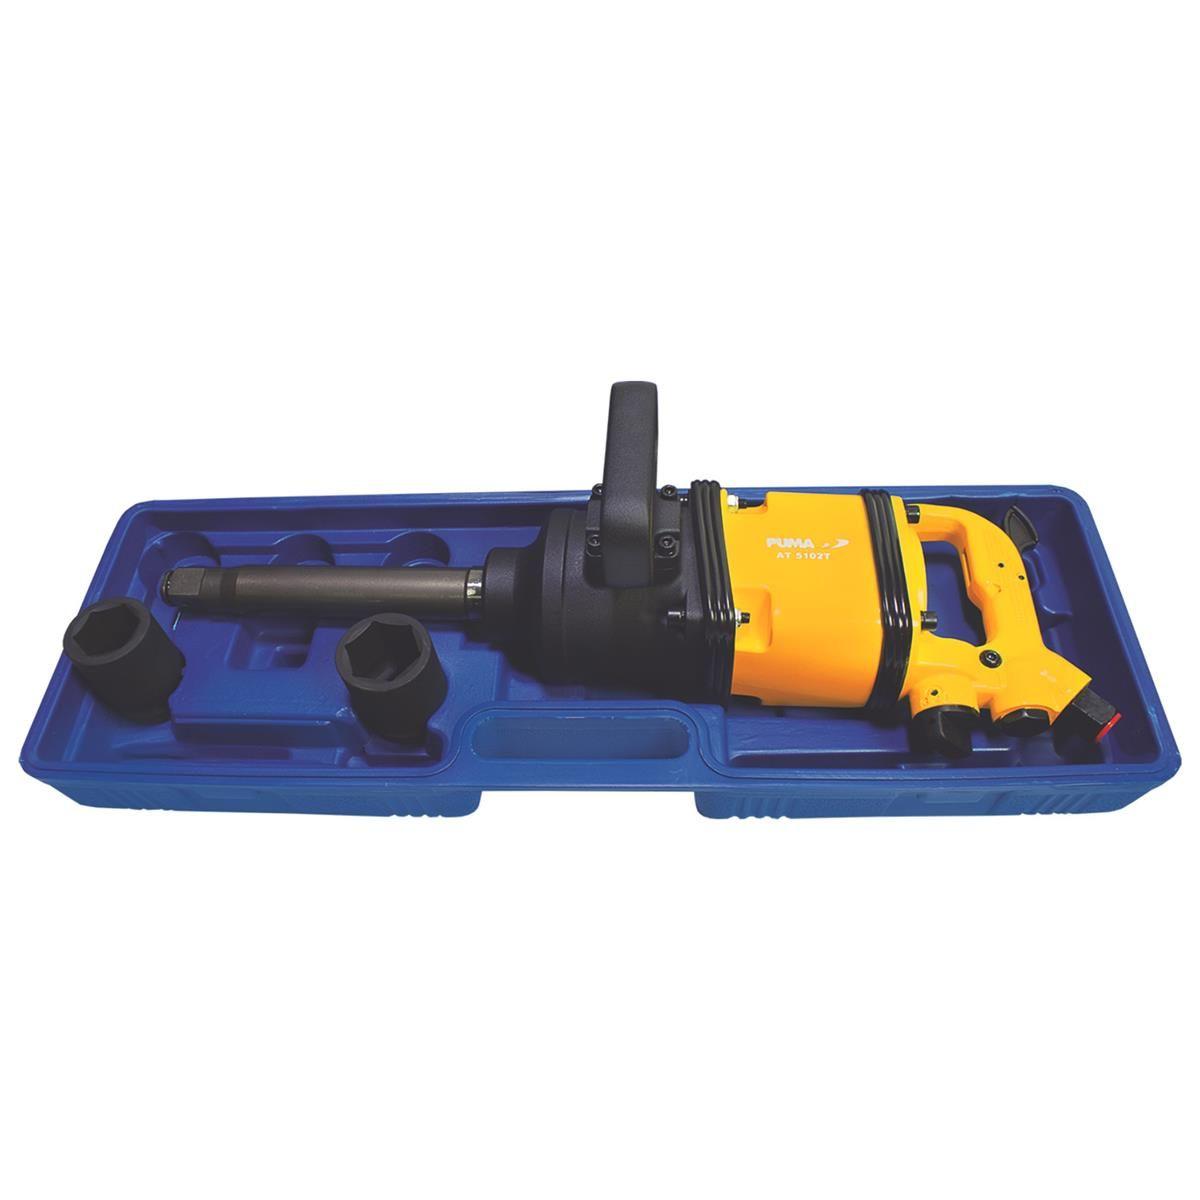 Chave de Impacto 1 Longa Torque 320 Kgf 5000 rpm AT-5102TK Soquete Puma